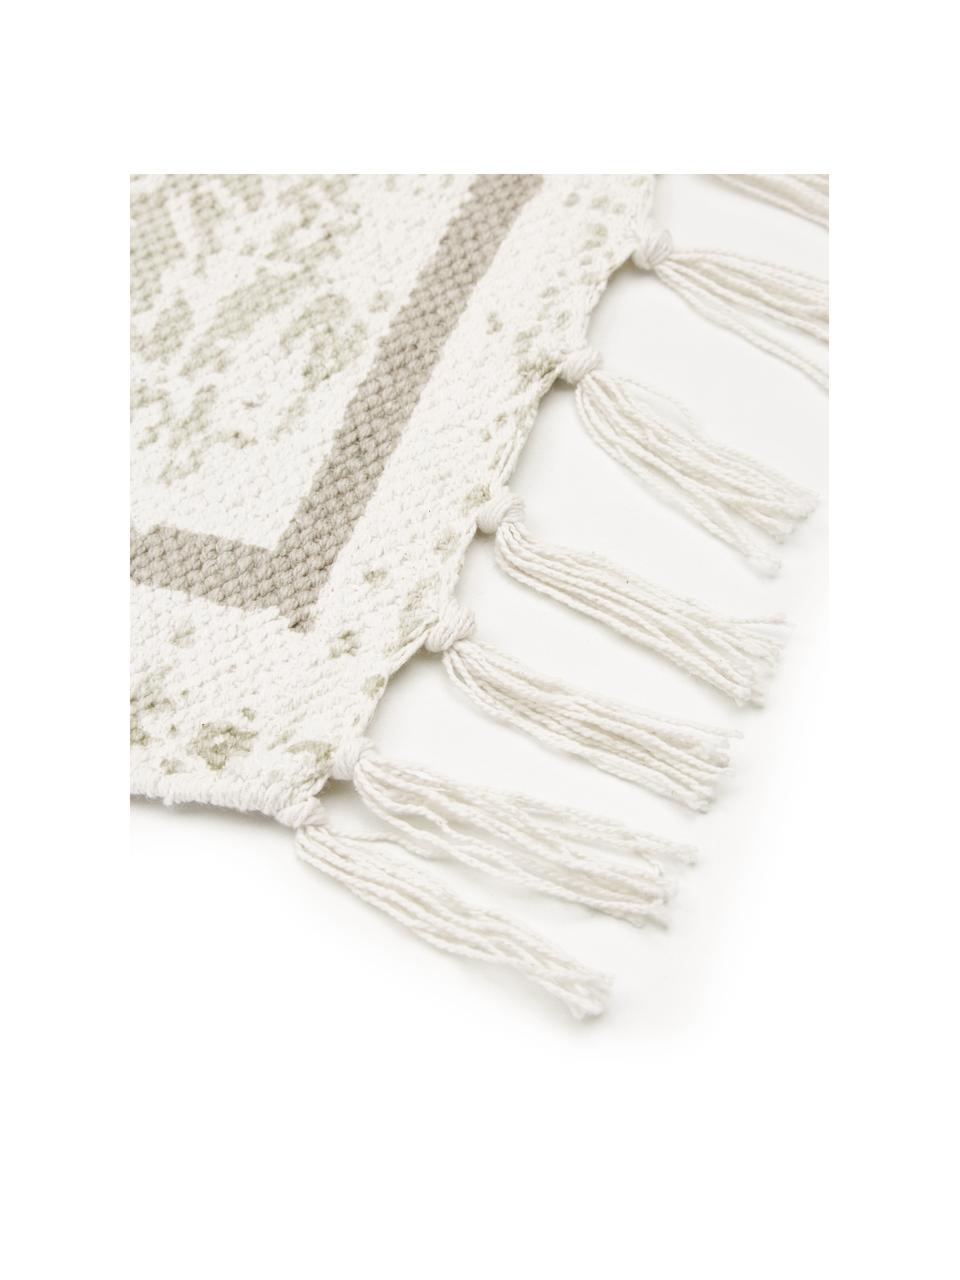 Tappeto vintage in cotone beige/taupe tessuto a mano Jasmine, Beige, Larg. 50 x Lung. 80 cm (taglia XXS)